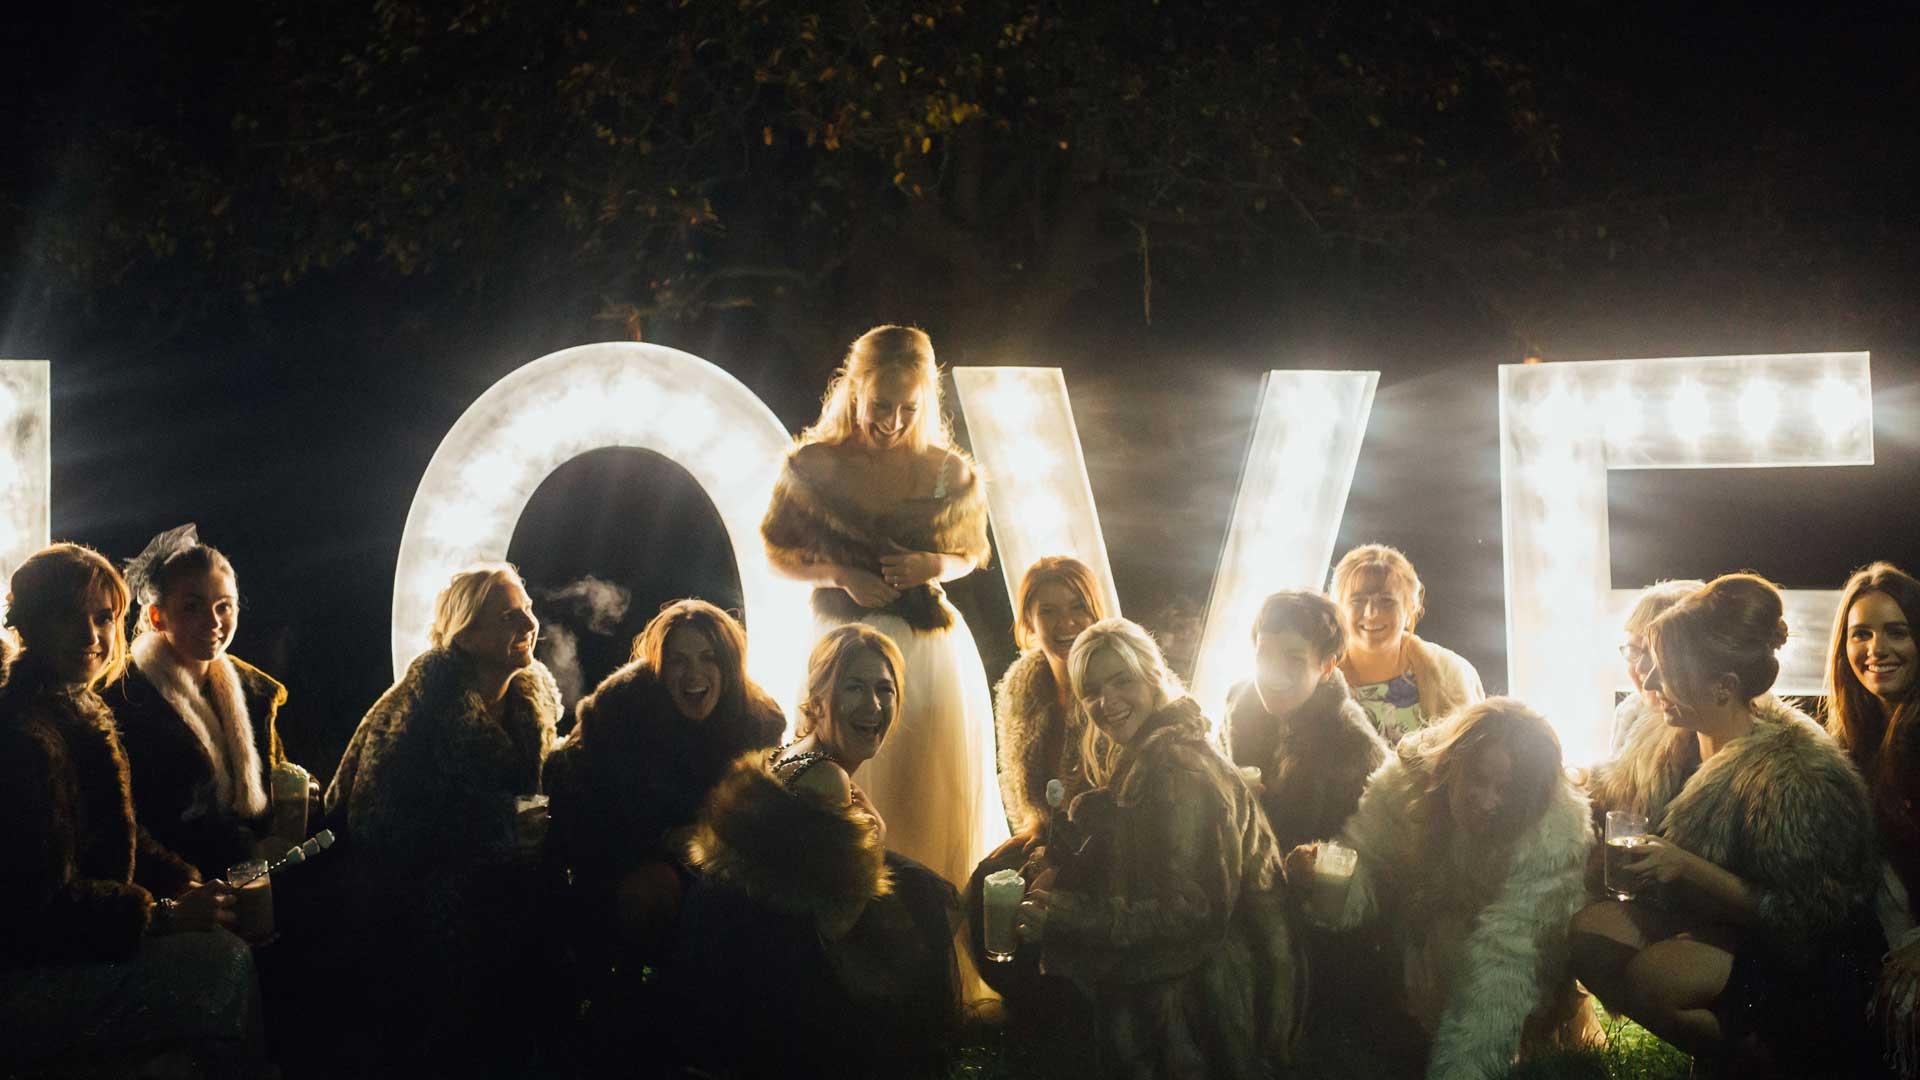 Illuminated Letter Hire